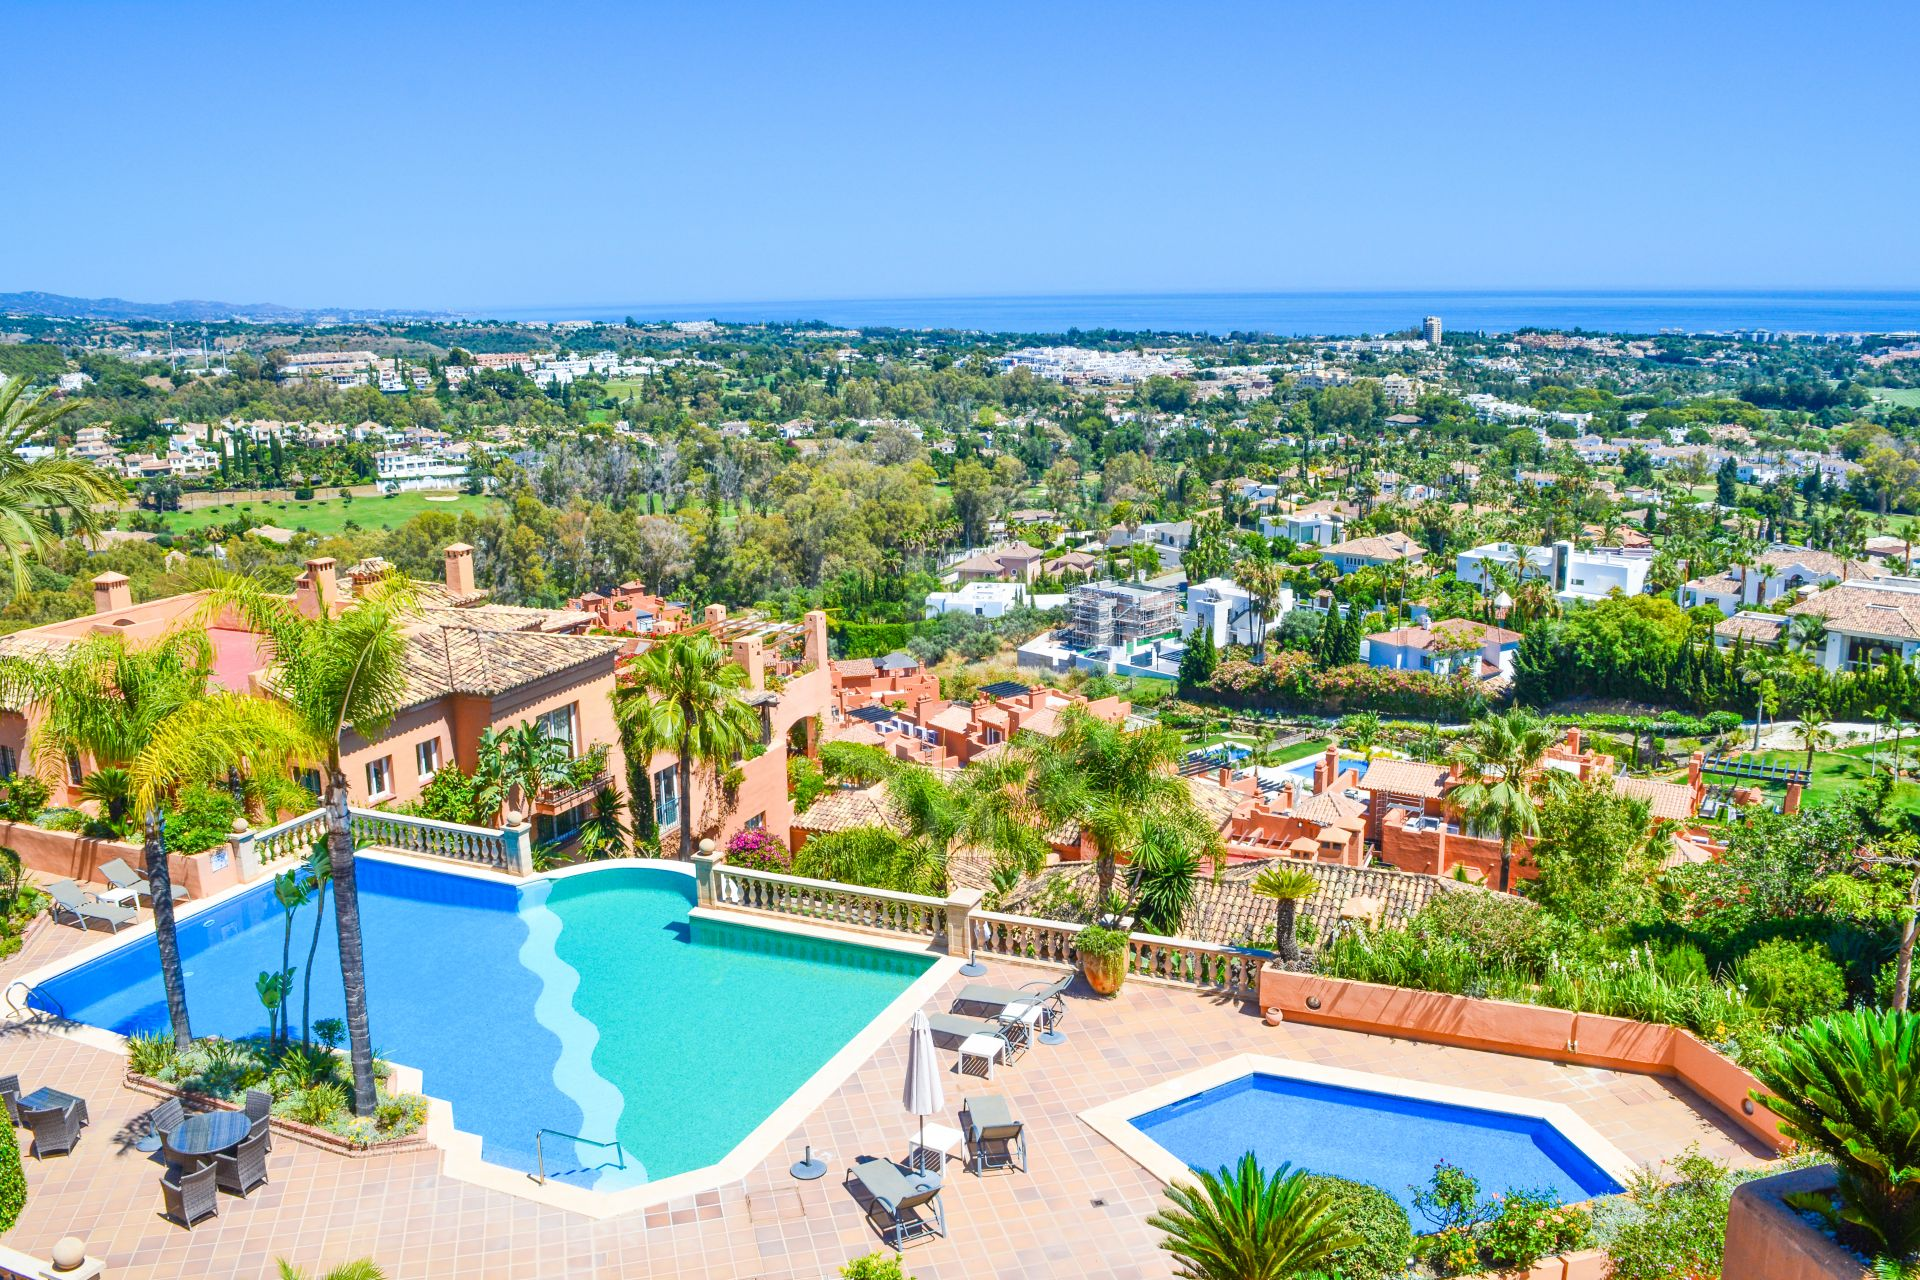 Apartment for sale in Los Belvederes, Nueva Andalucia